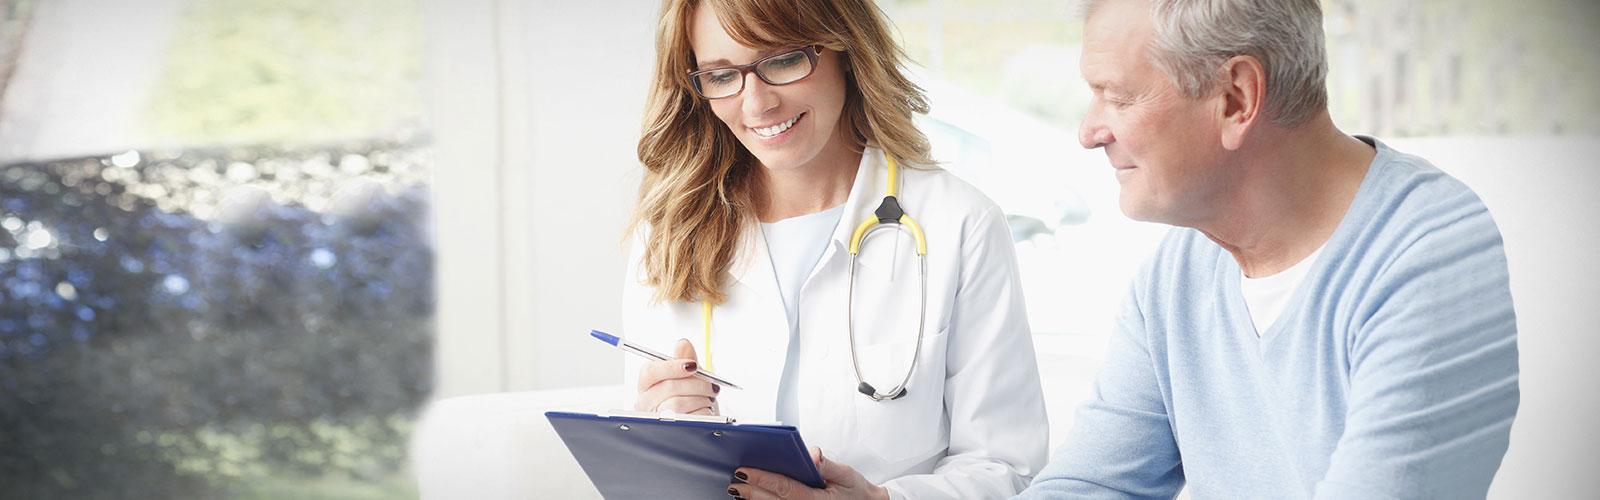 DRI Insurance Information